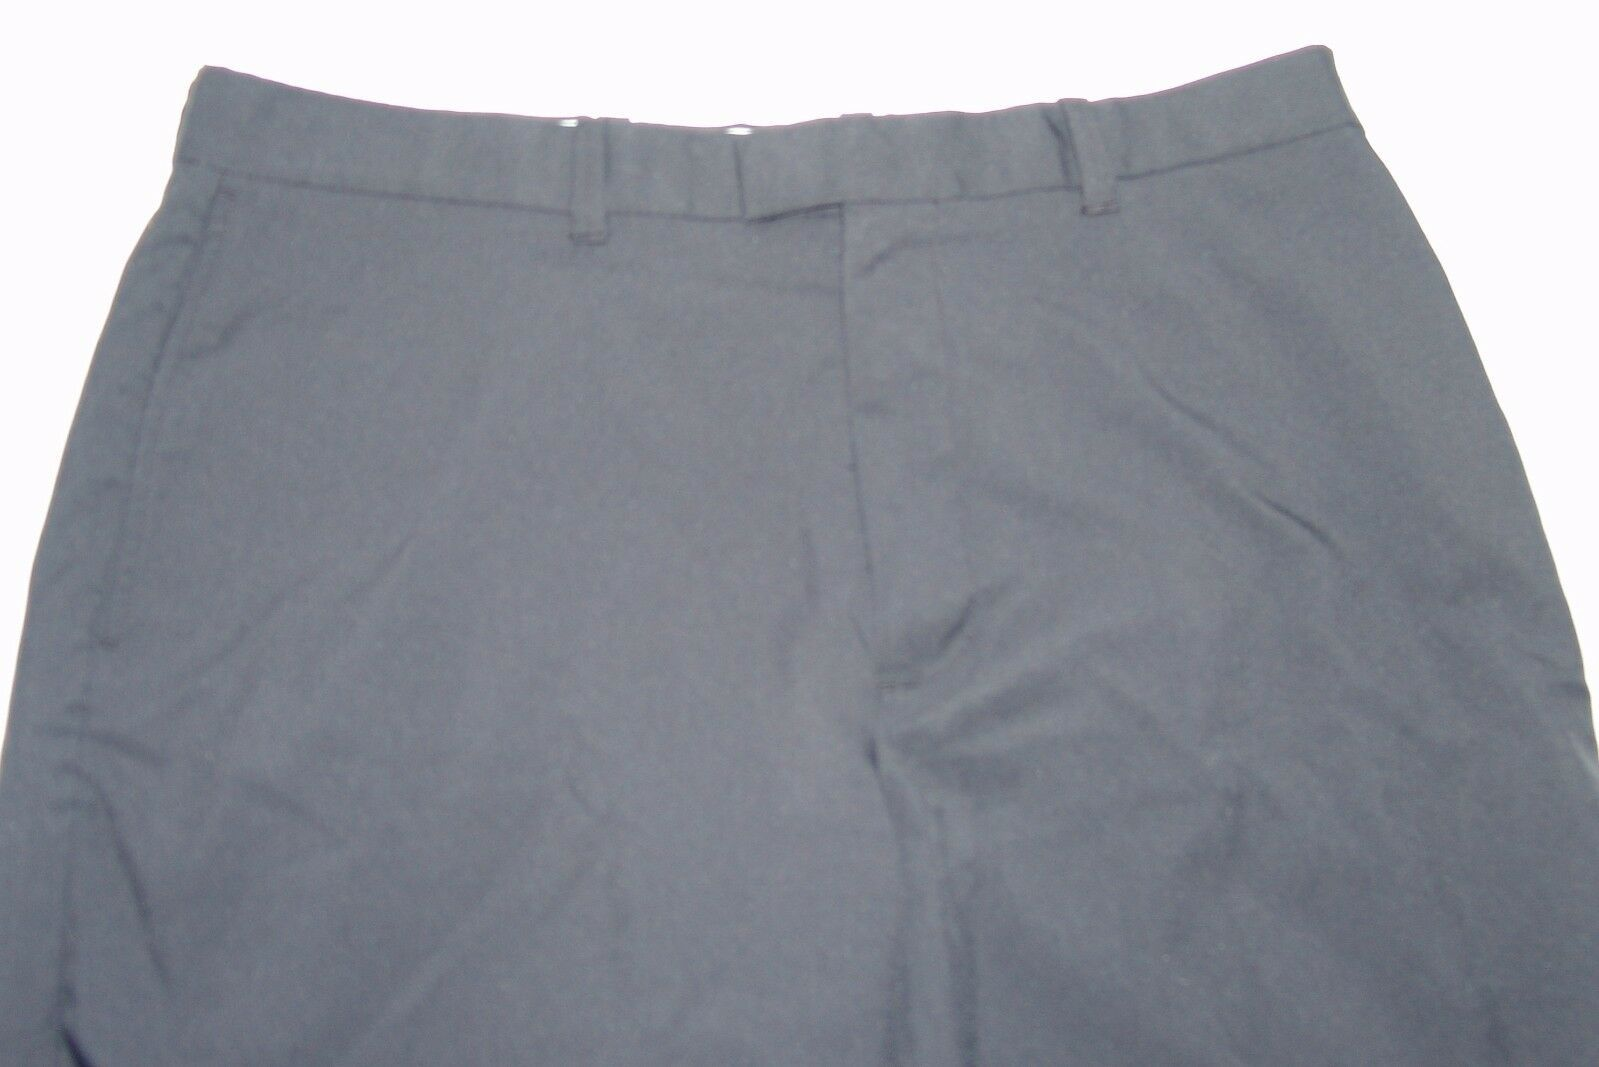 Callaway Navy Blue Golf Shorts Mens 36 Flat Front